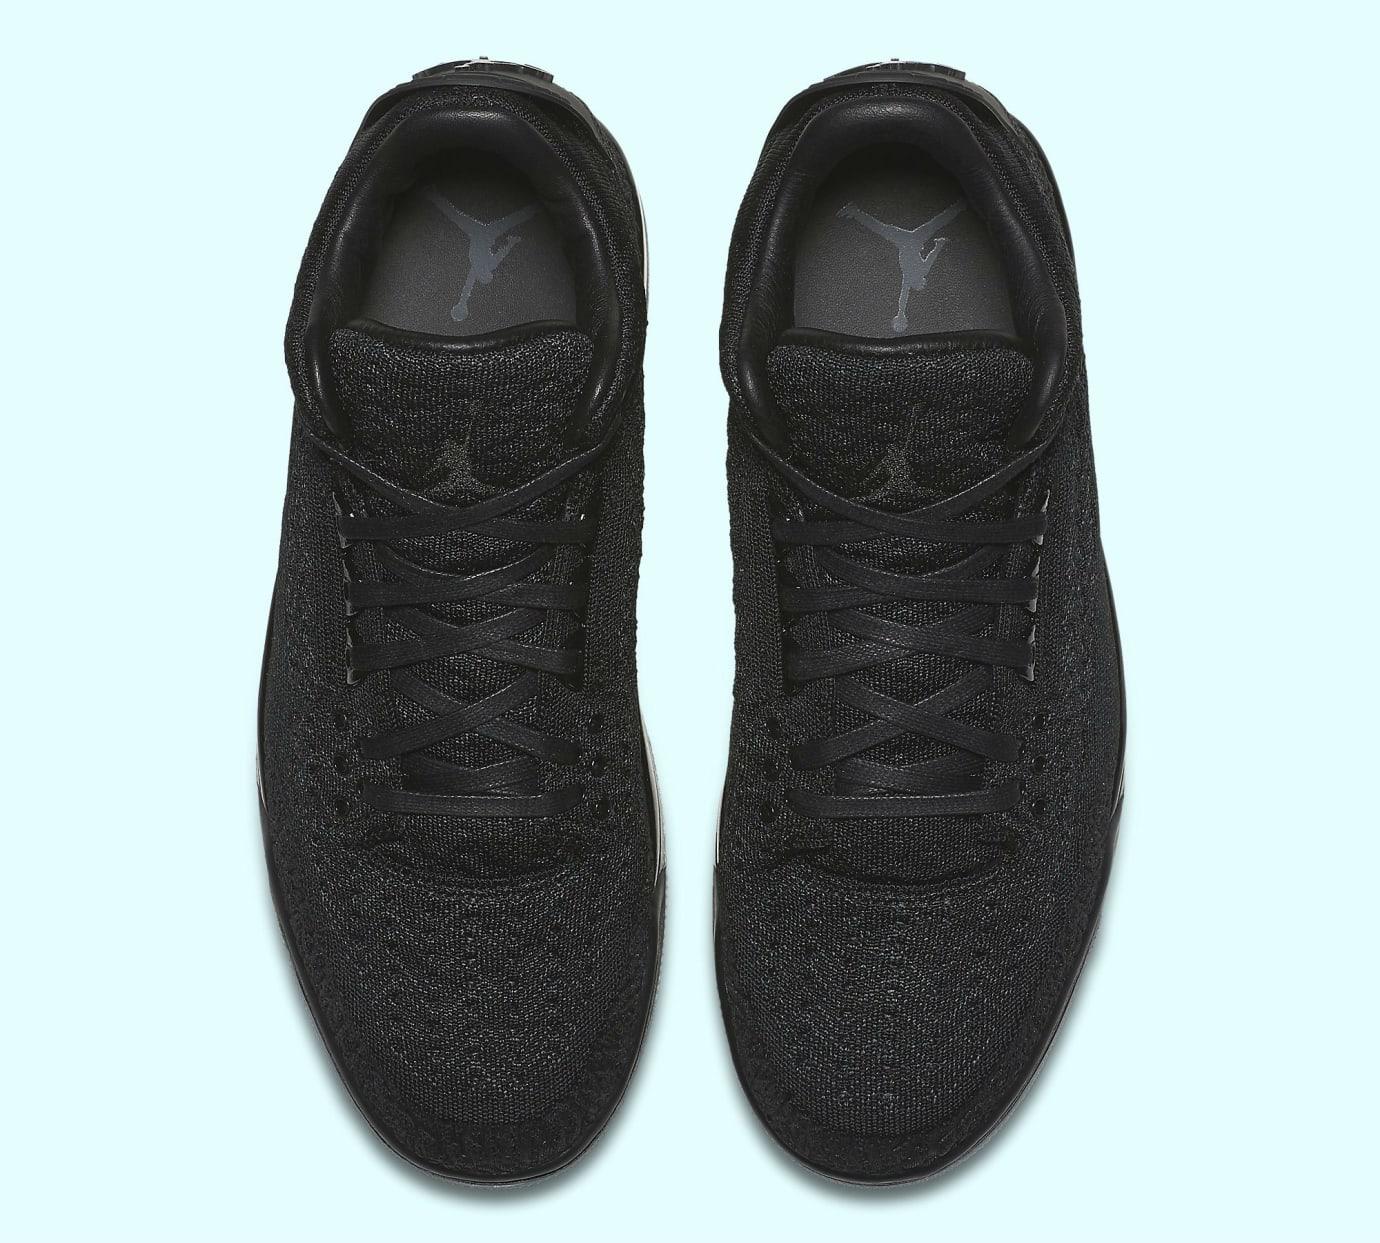 Air Jordan 3 Flyknit Black Release Date AQ1005-001 Top